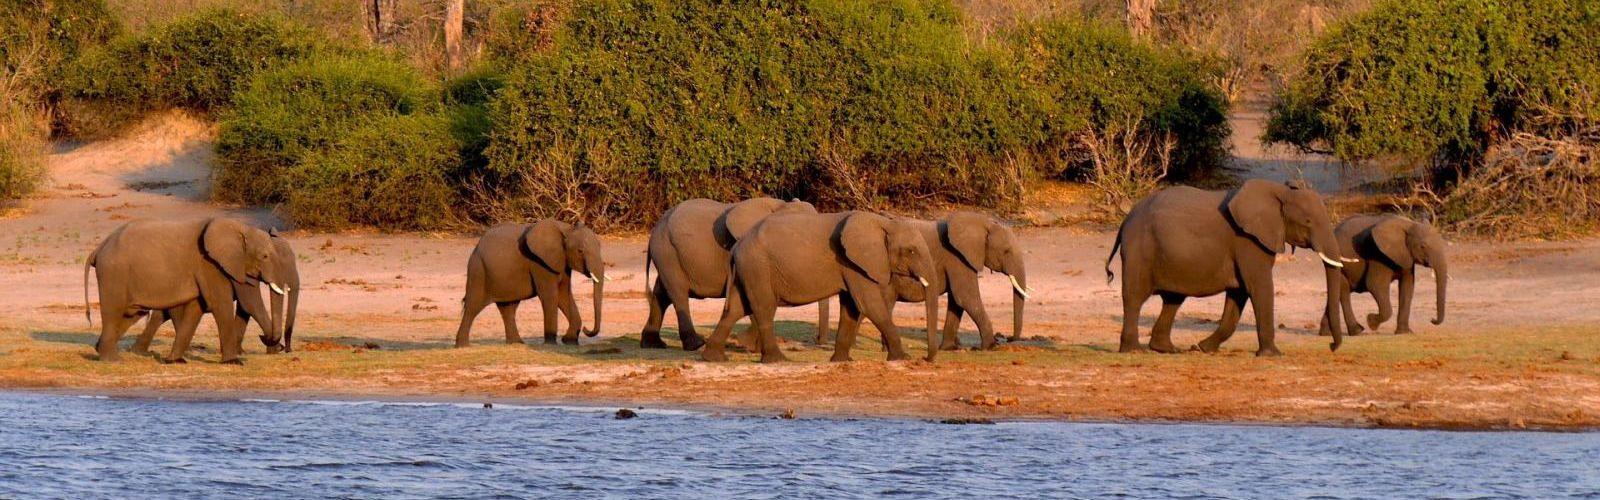 PhotoFly Travel Club | botswana trip featured imagexx | PhotoFly Travel Club